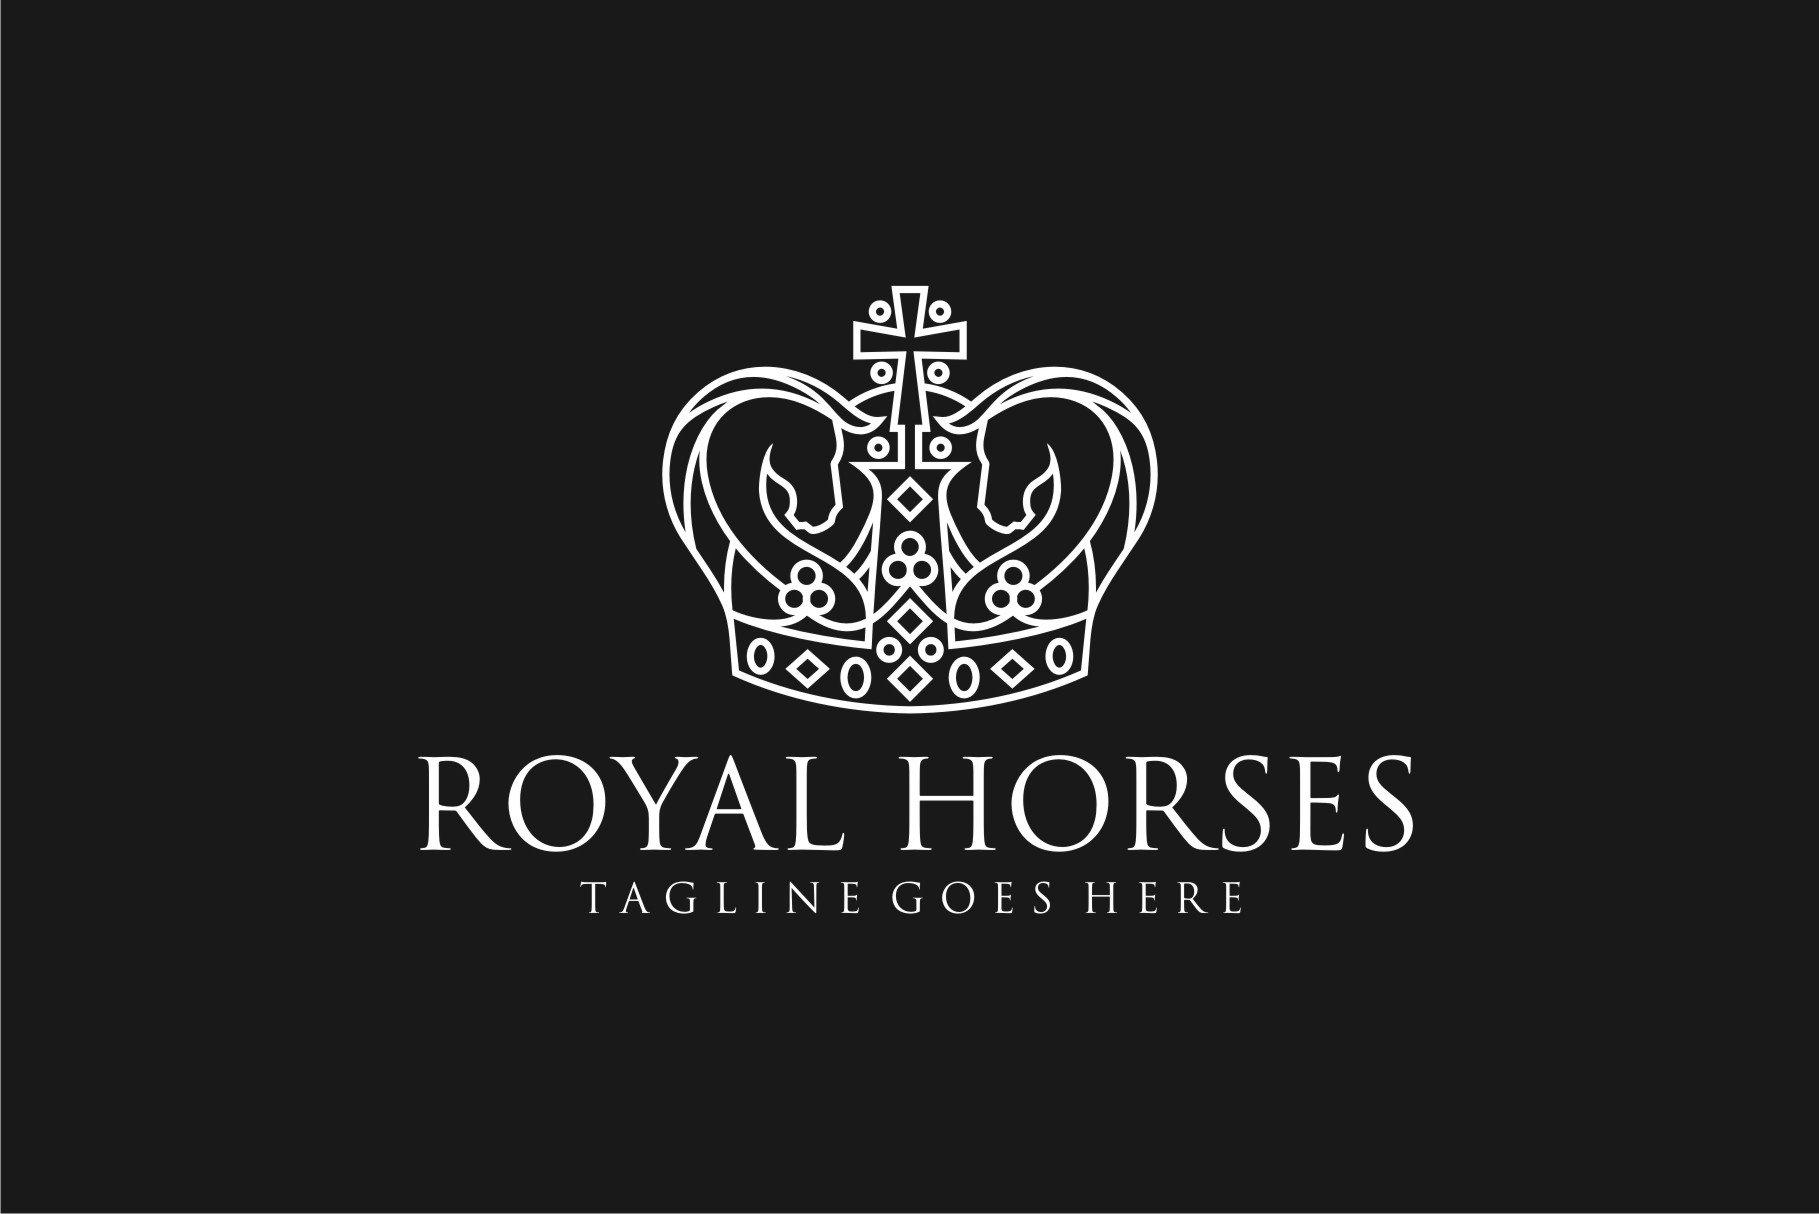 Royal Horse 541175 Logos Design Bundles